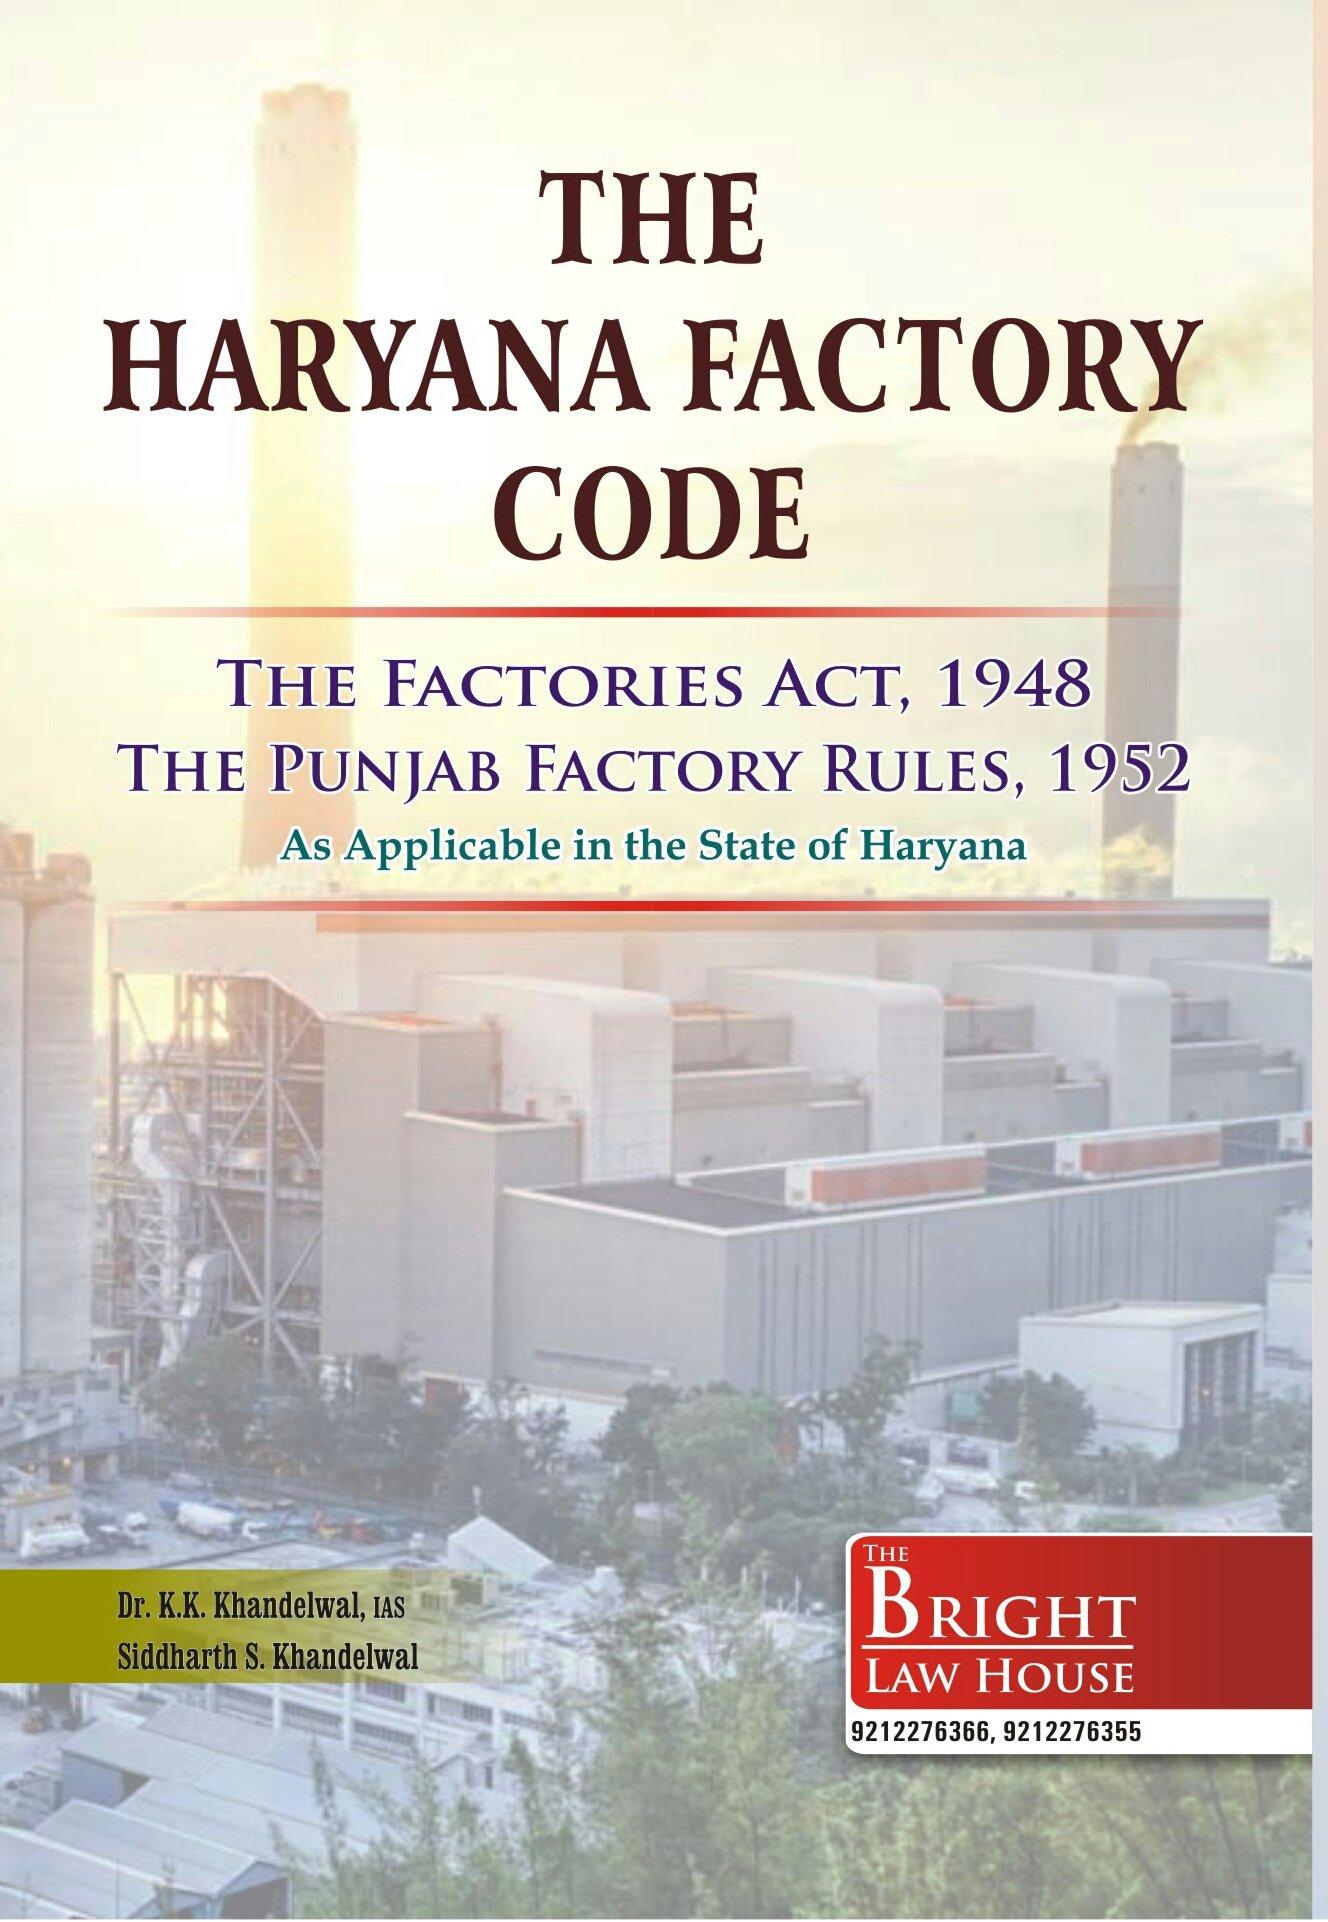 Buy HARYANA FACTORY CODE (THE PUNJAB FACTORY RULES, 1952) Book ...